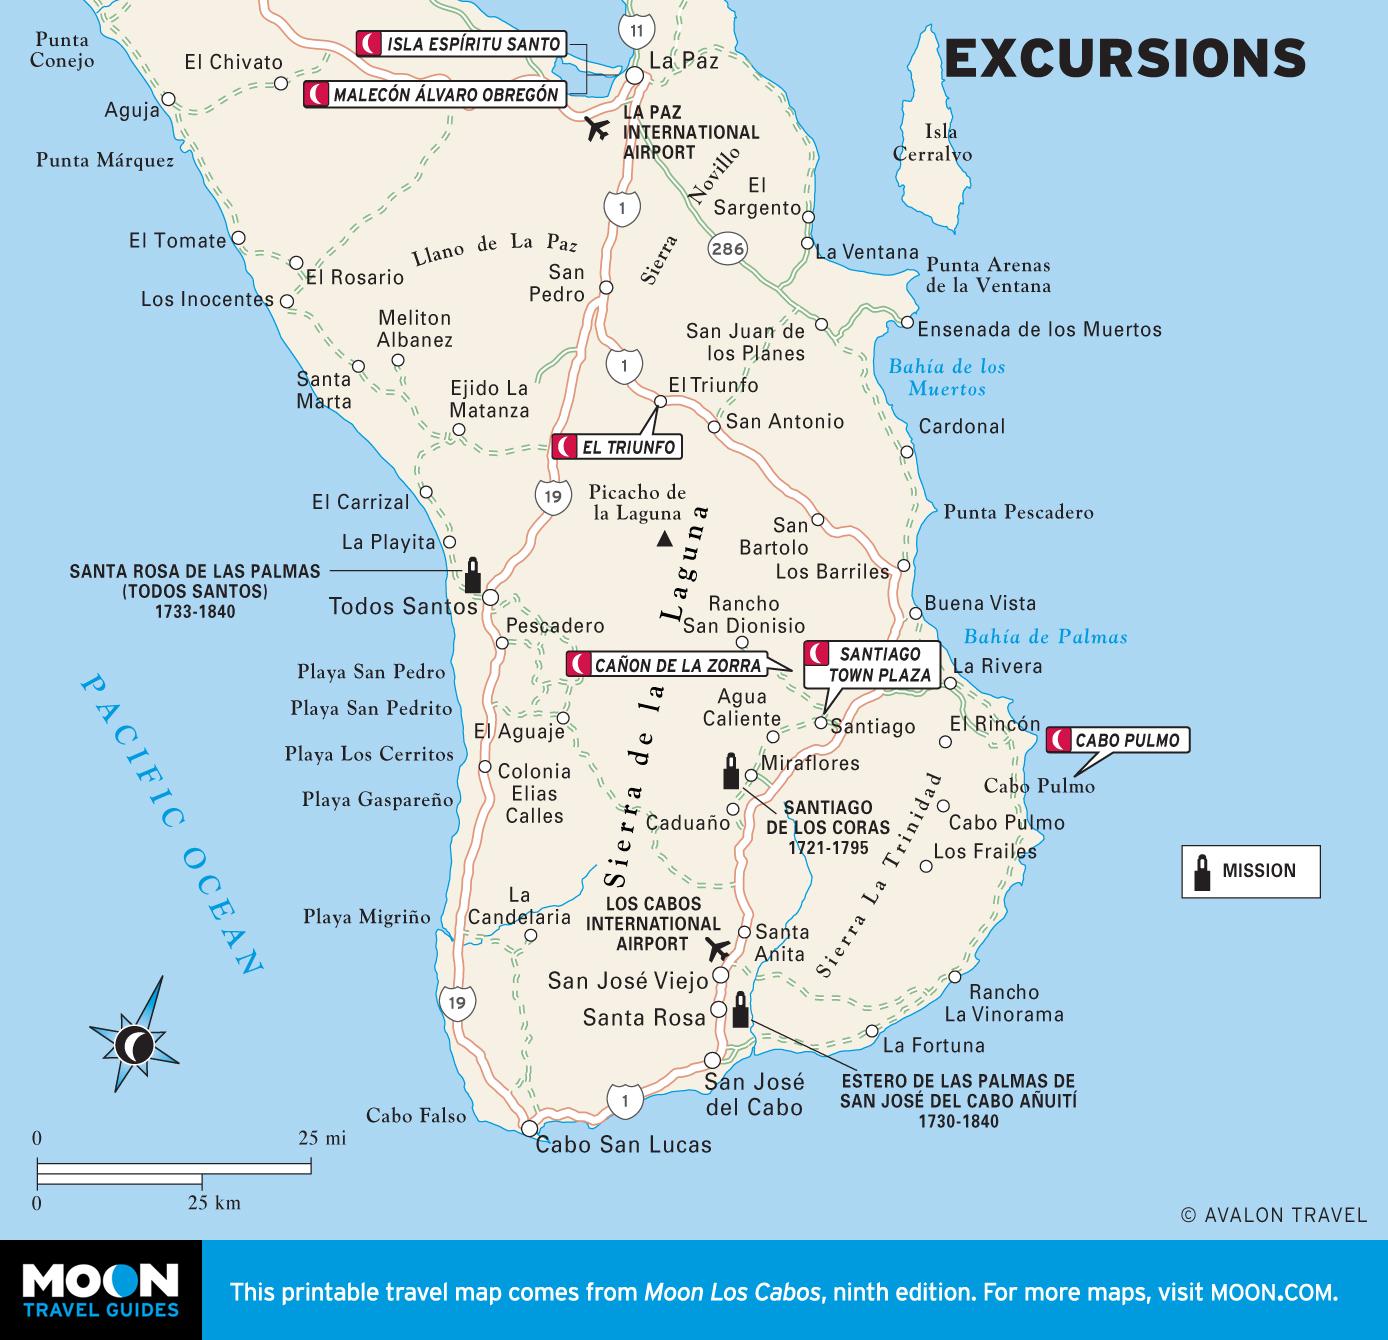 Baja | Moon Travel Guides Map Baja Mexico on mazatlan mexico map, cancun mexico map, puerto vallarta map, pacific coast mexico map, san carlos mexico map, mexico city map, cabo san lucas map, la paz mexico map, los barriles map, mexico road map, costa rica map, ensenada map, guaymas mexico map, mexico border map, cabo pulmo map, us and mexico map, el golfo mexico map, bahamas map, jalisco mexico map, cabo mexico map,